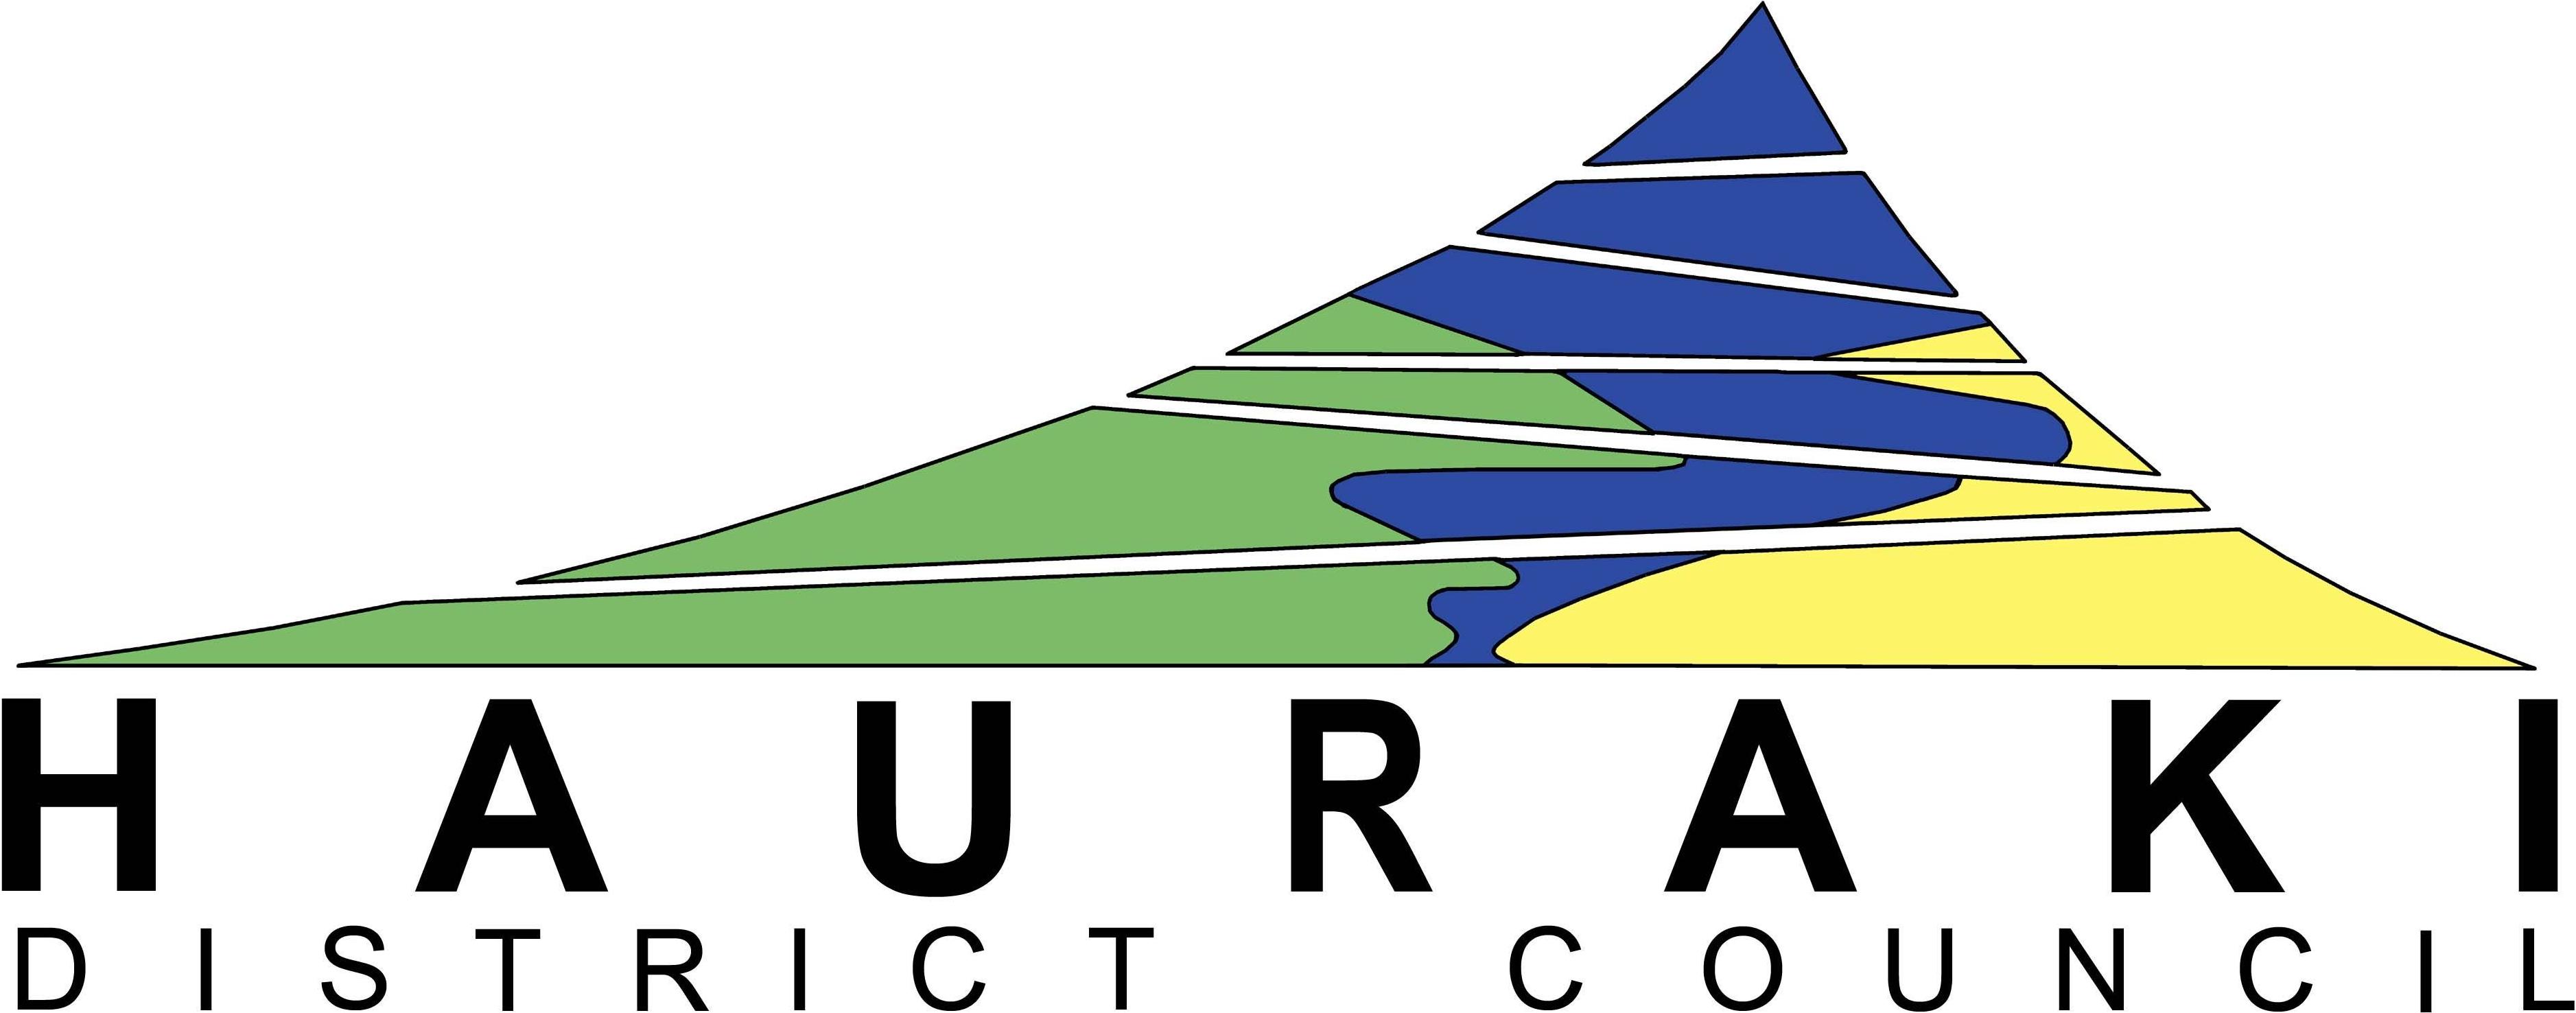 Hauraki District